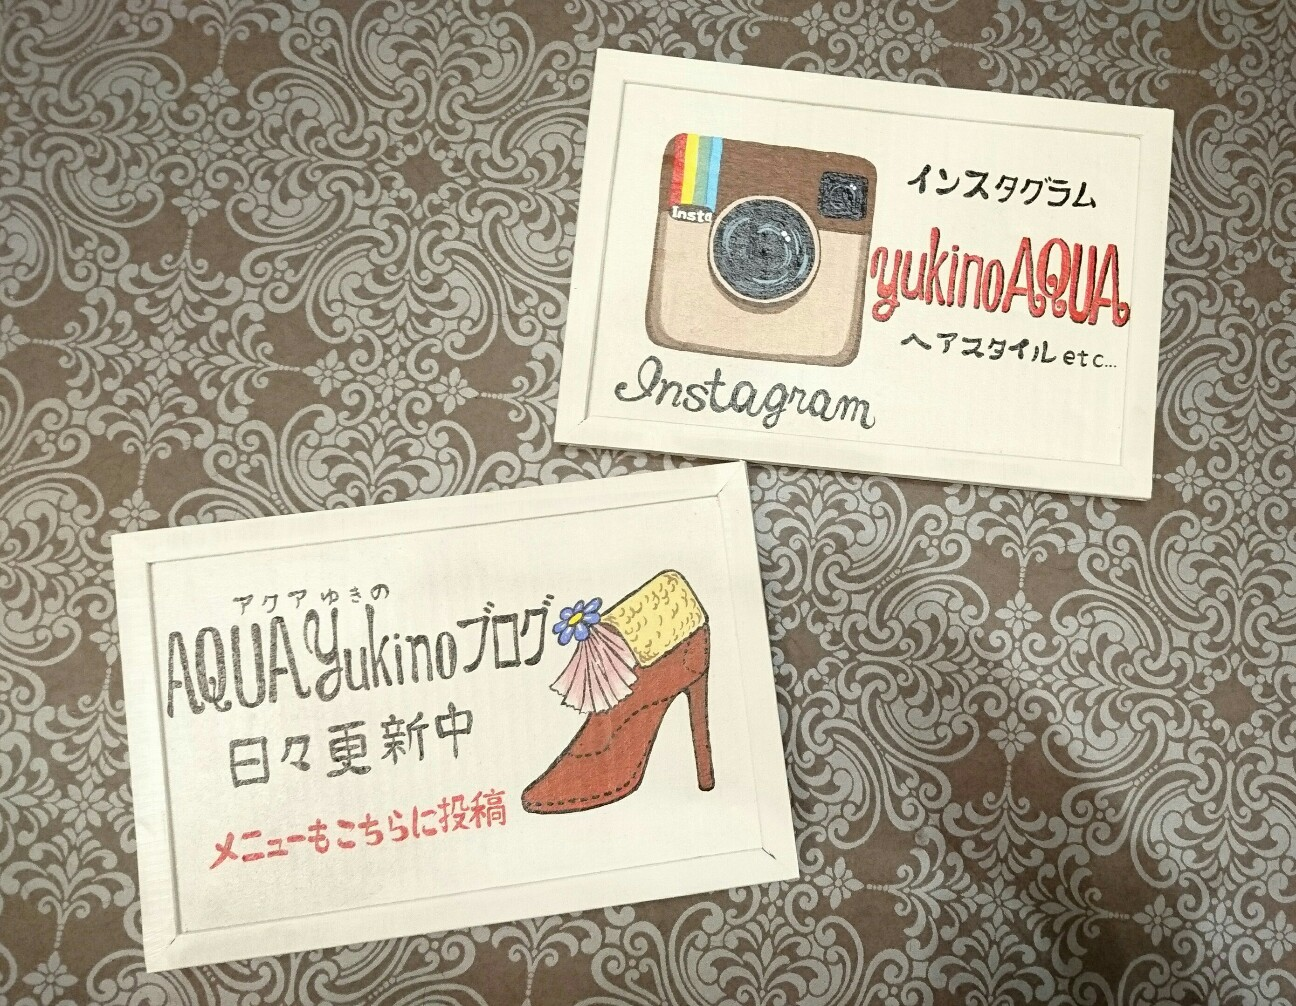 f:id:aquayukino:20180415215041j:image